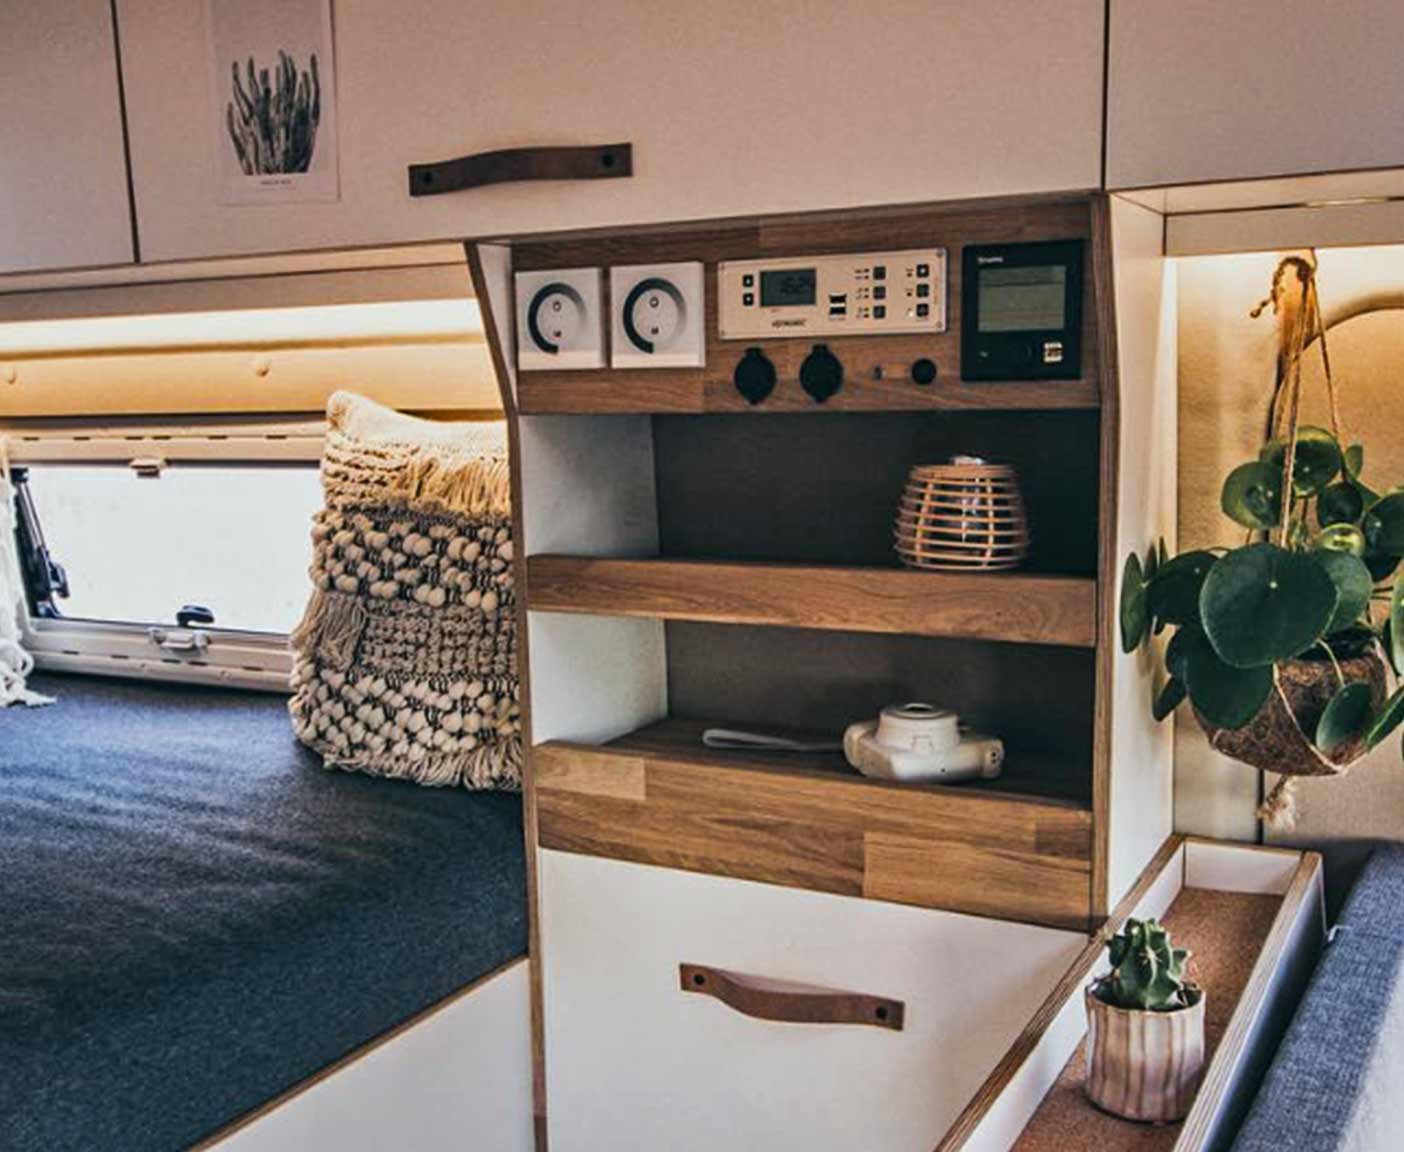 wohnmobil-ausbau-camper-ausbauten-selbstausbau-OurDucatoHome